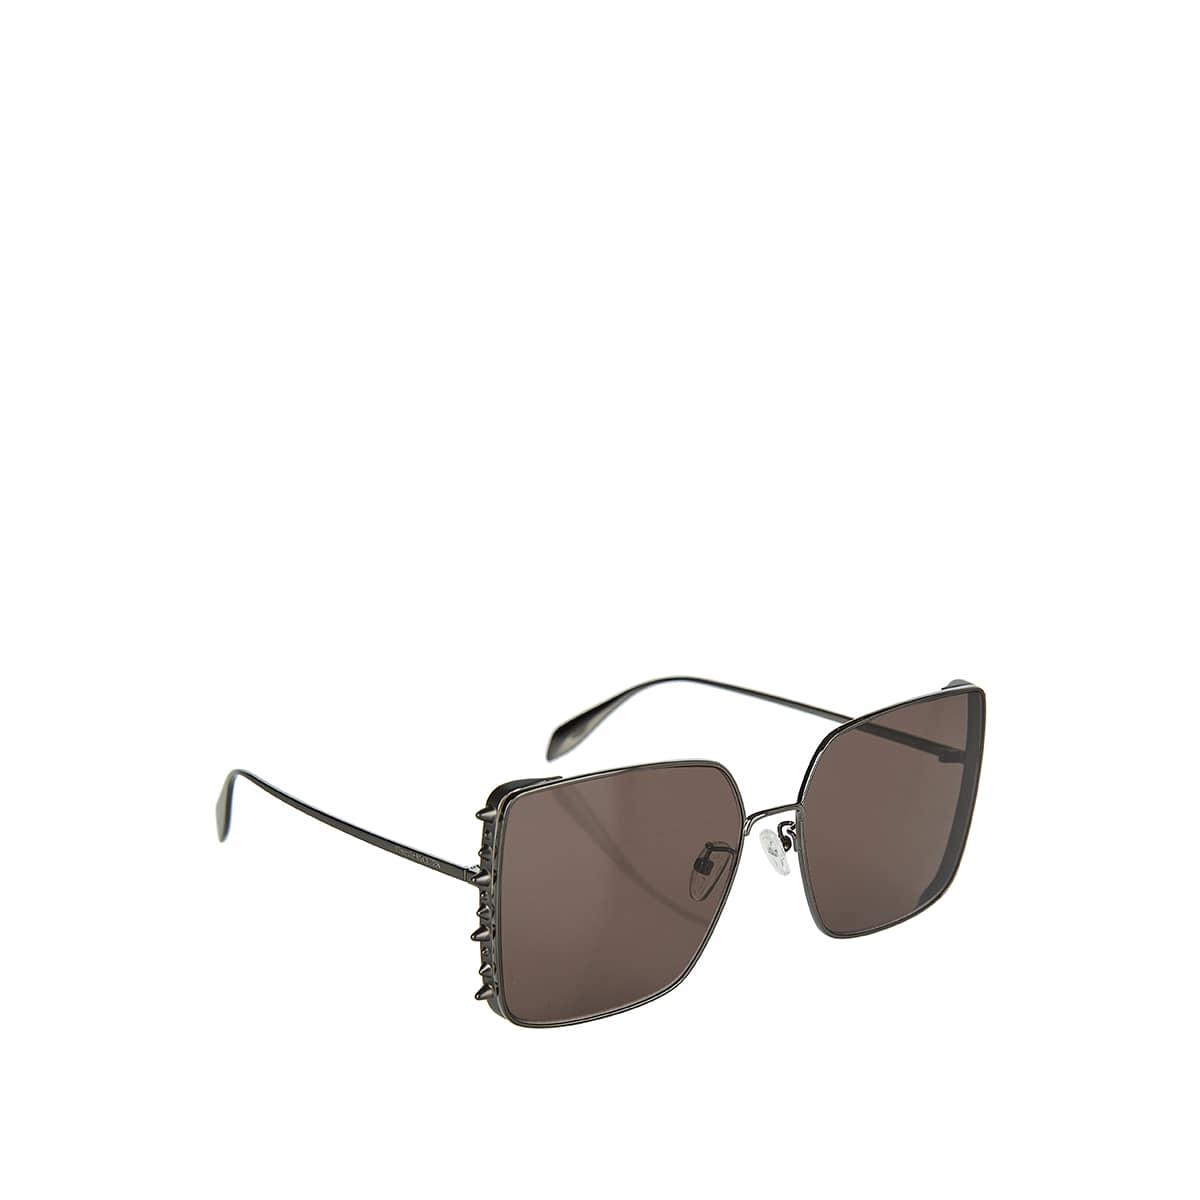 Oversized studded metal sunglasses